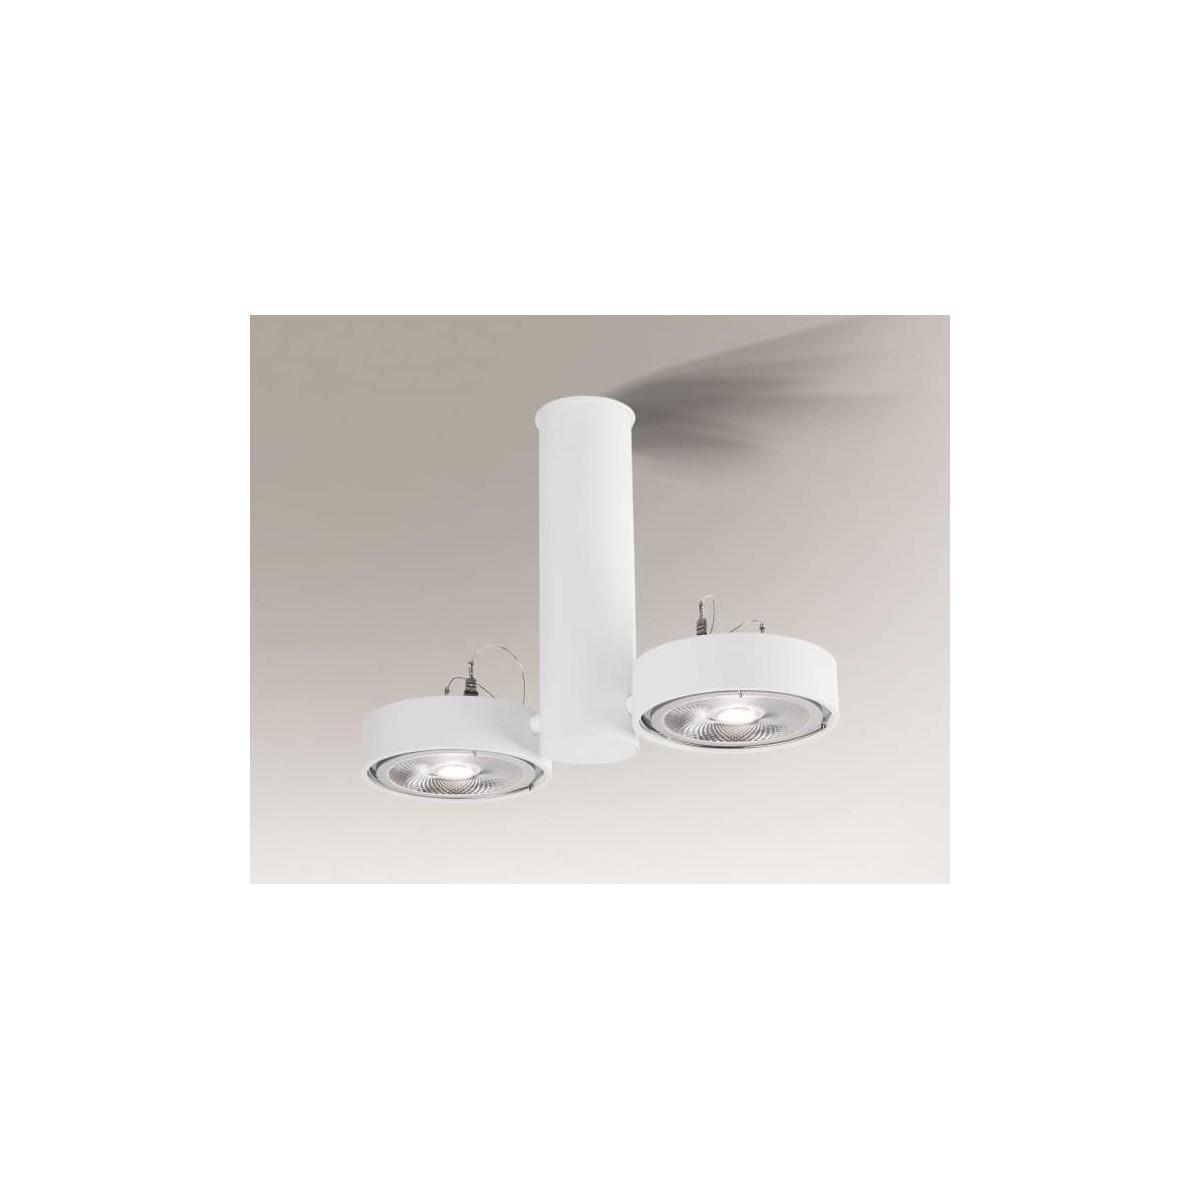 Shilo NATORI 2xAR111 12V biały reflektor 7214